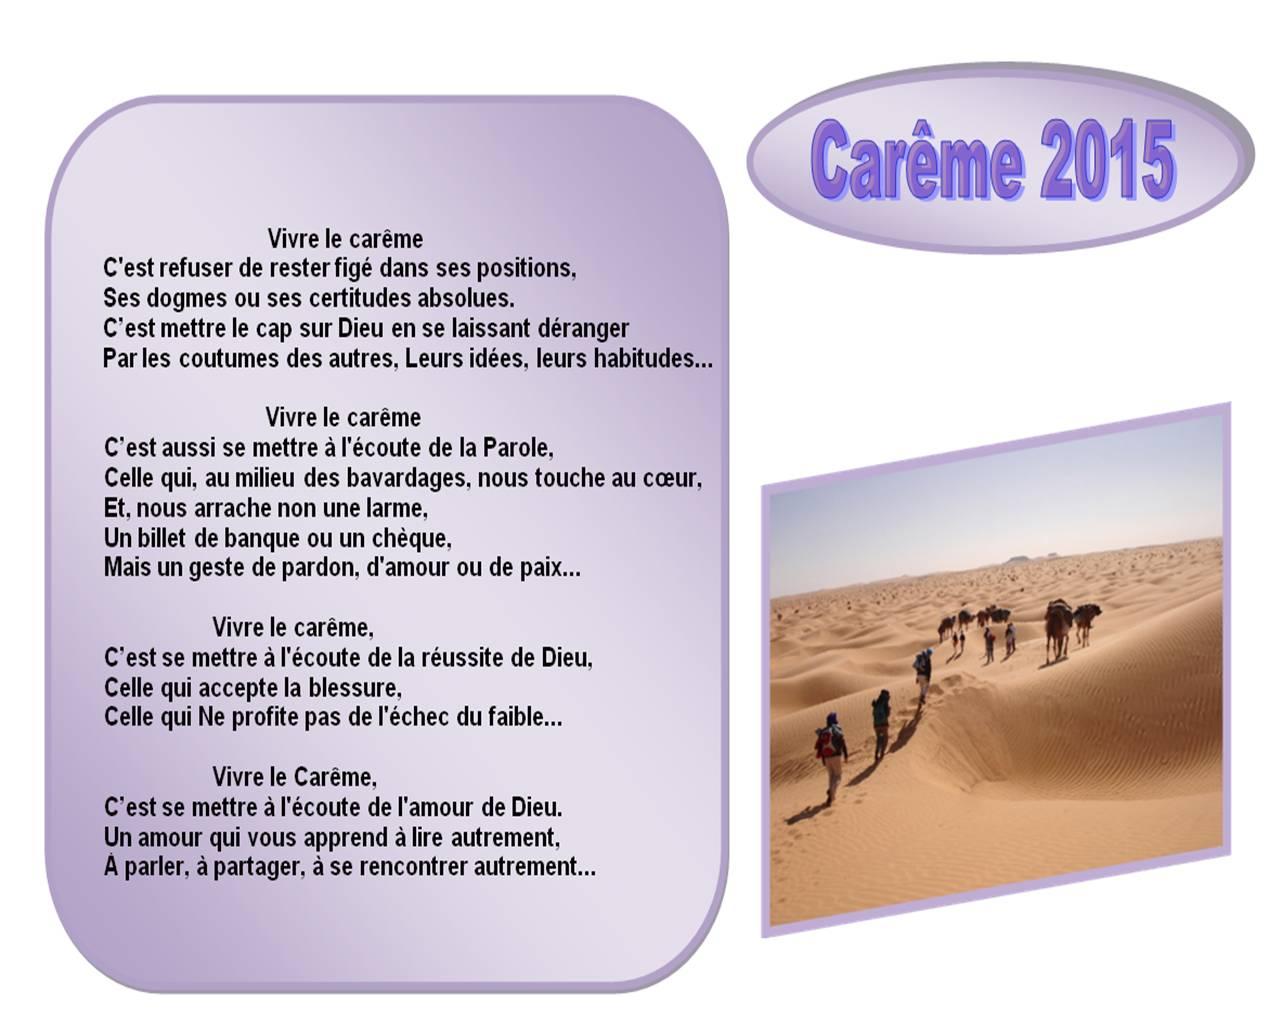 Carême 2015 à Saint-Nicolas